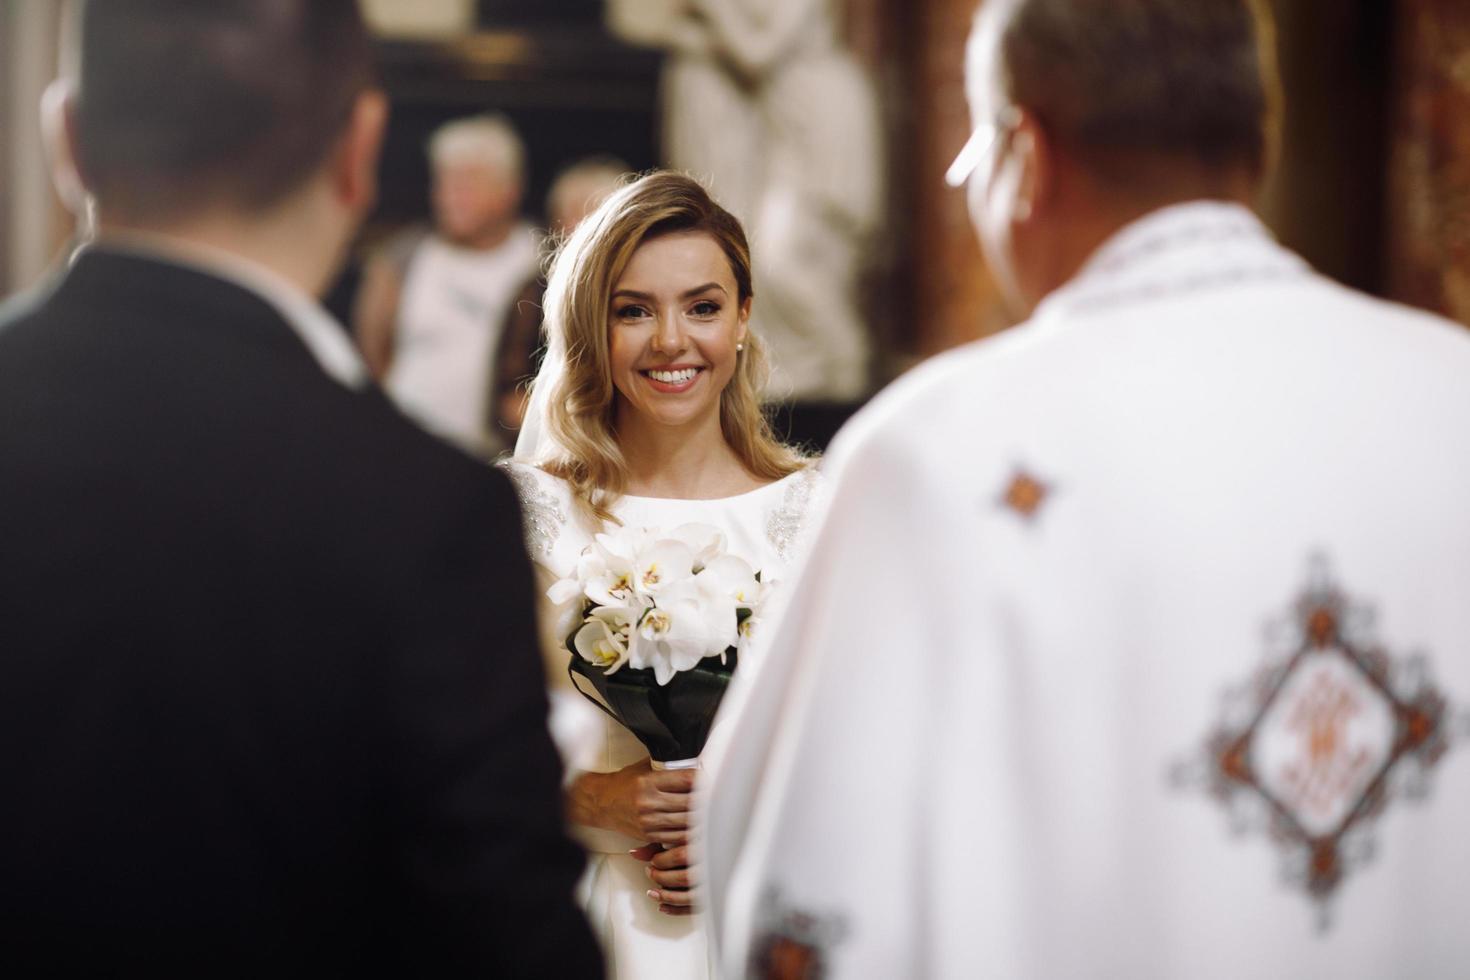 Europe, 2018 - Couple marries inside a Catholic Church. photo